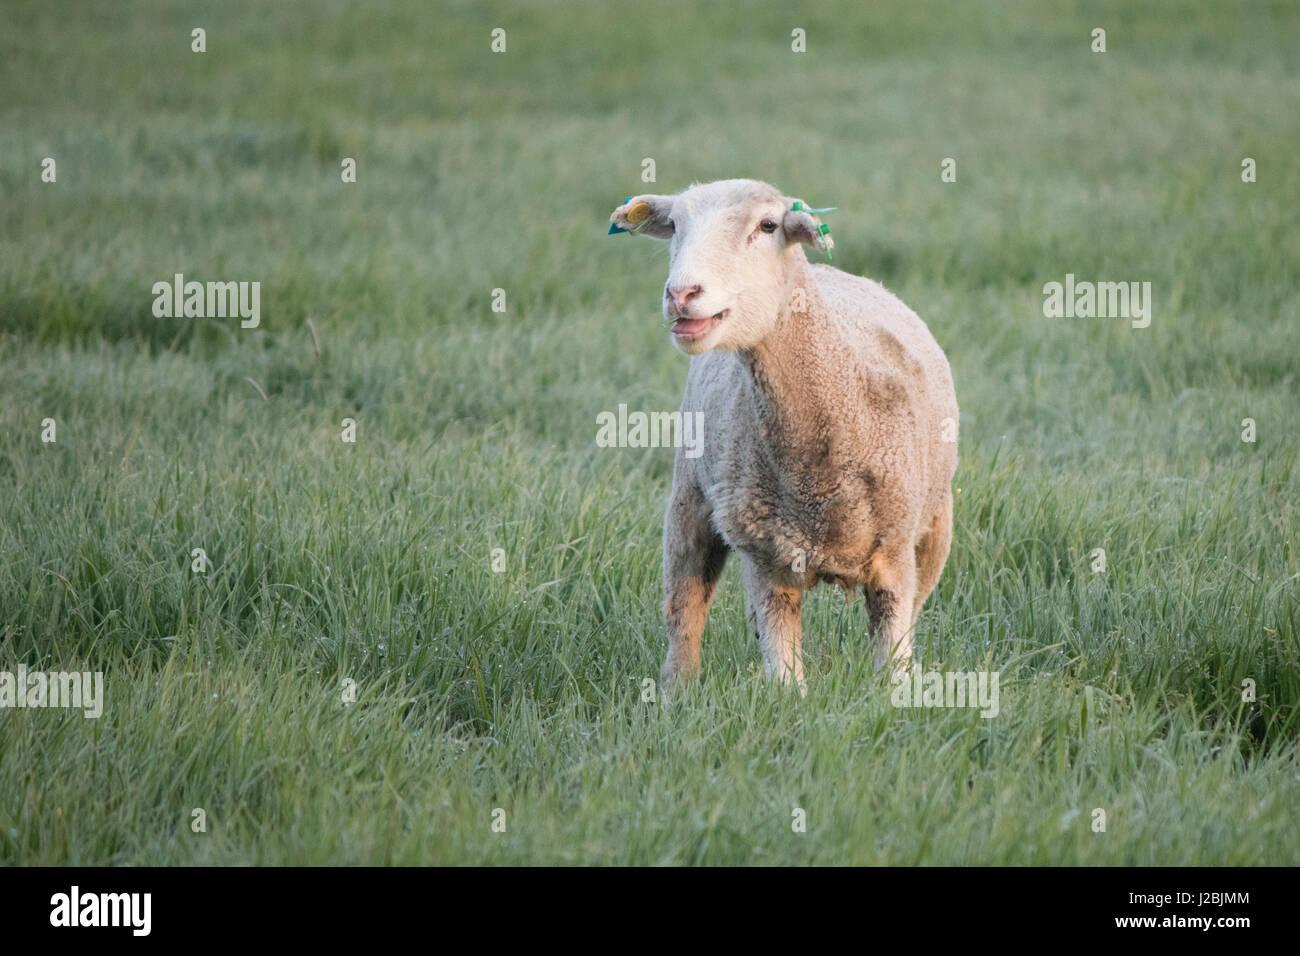 One ewe standing in a dewy field - Stock Image